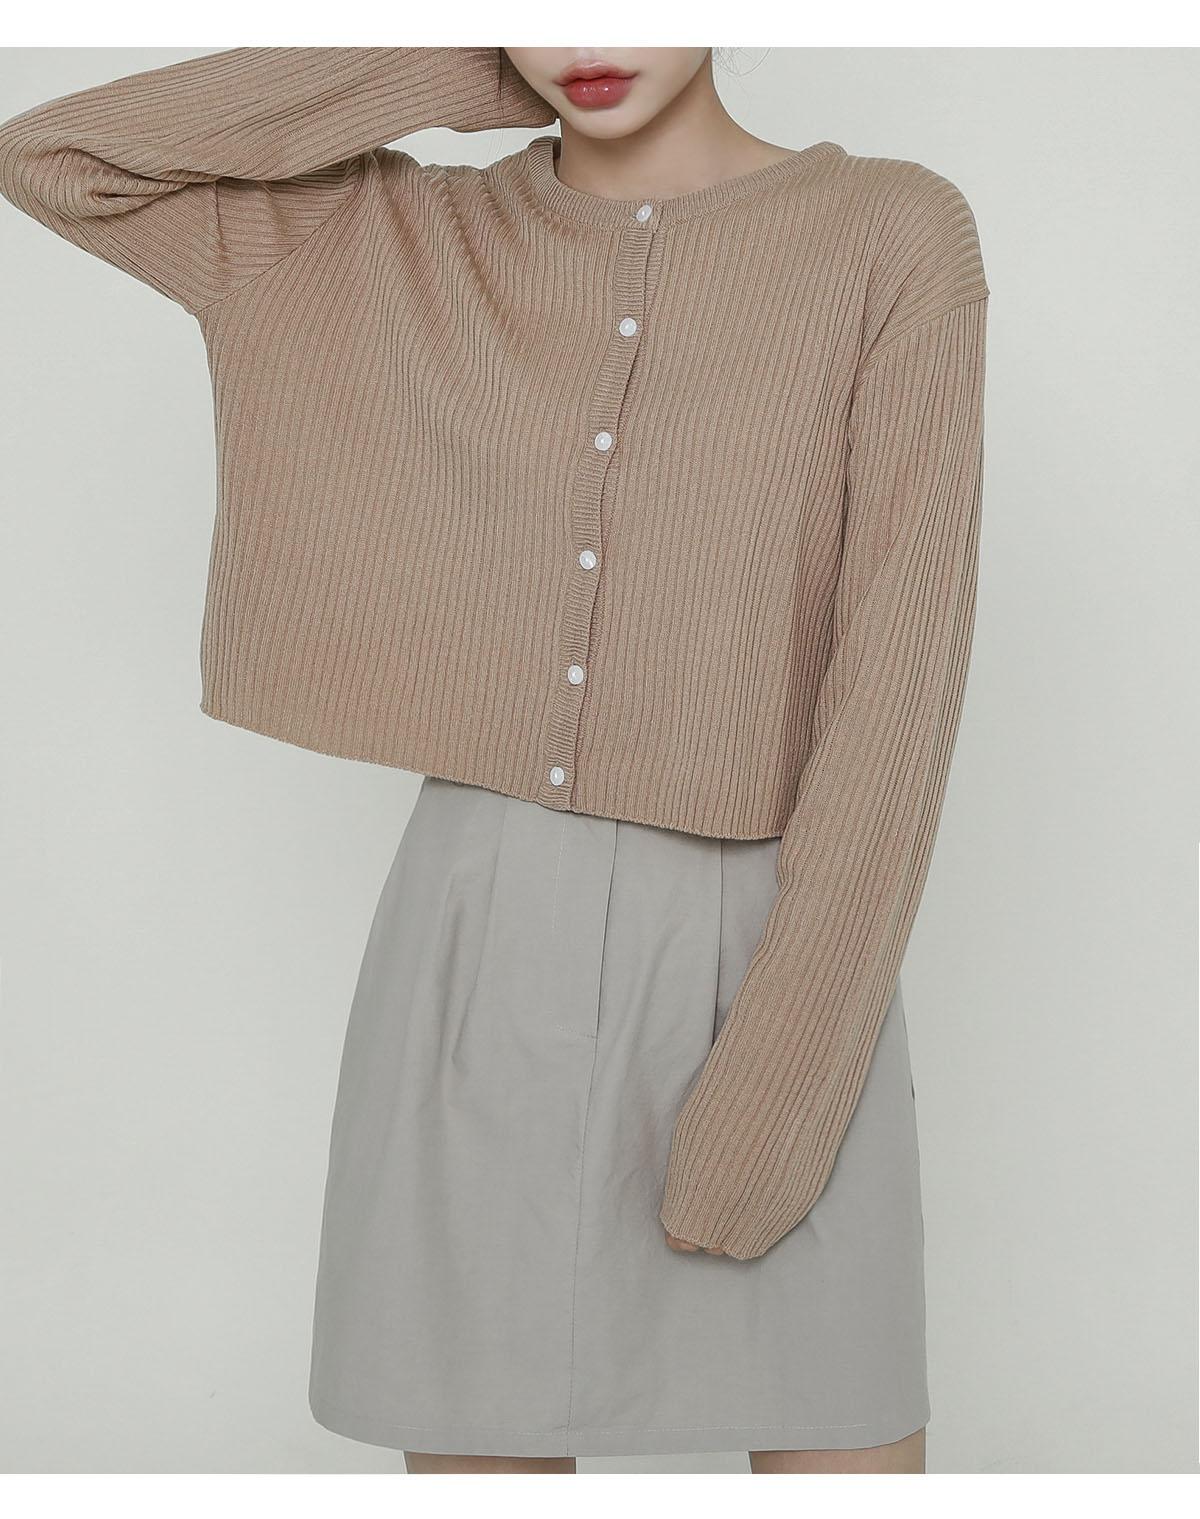 Rosie crop cardigan